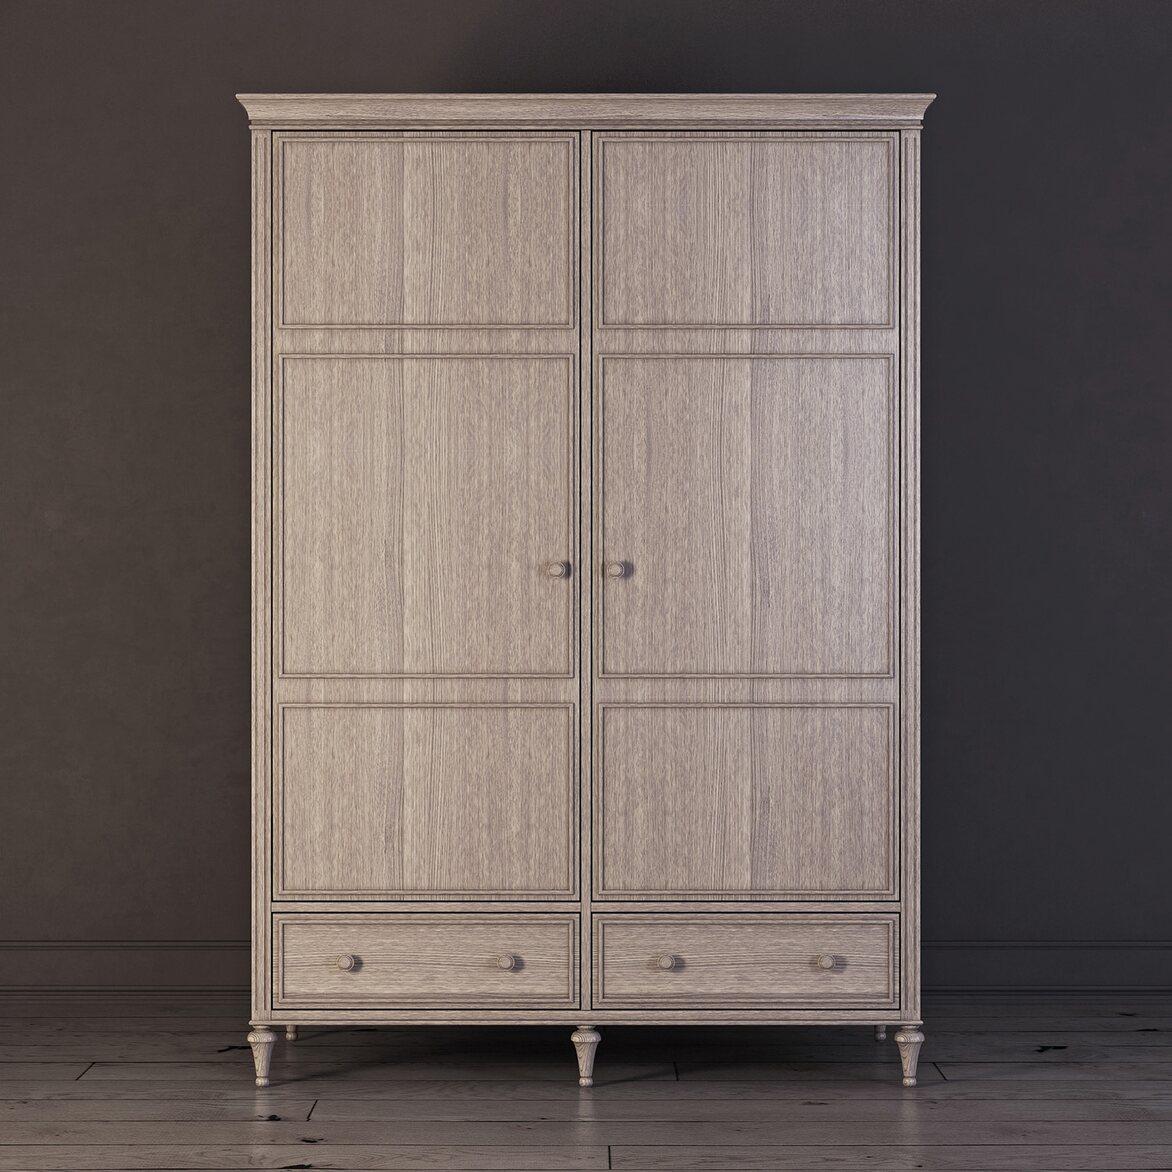 Шкаф двухстворчатый Riverdi, светлый дуб | Платяные шкафы Kingsby